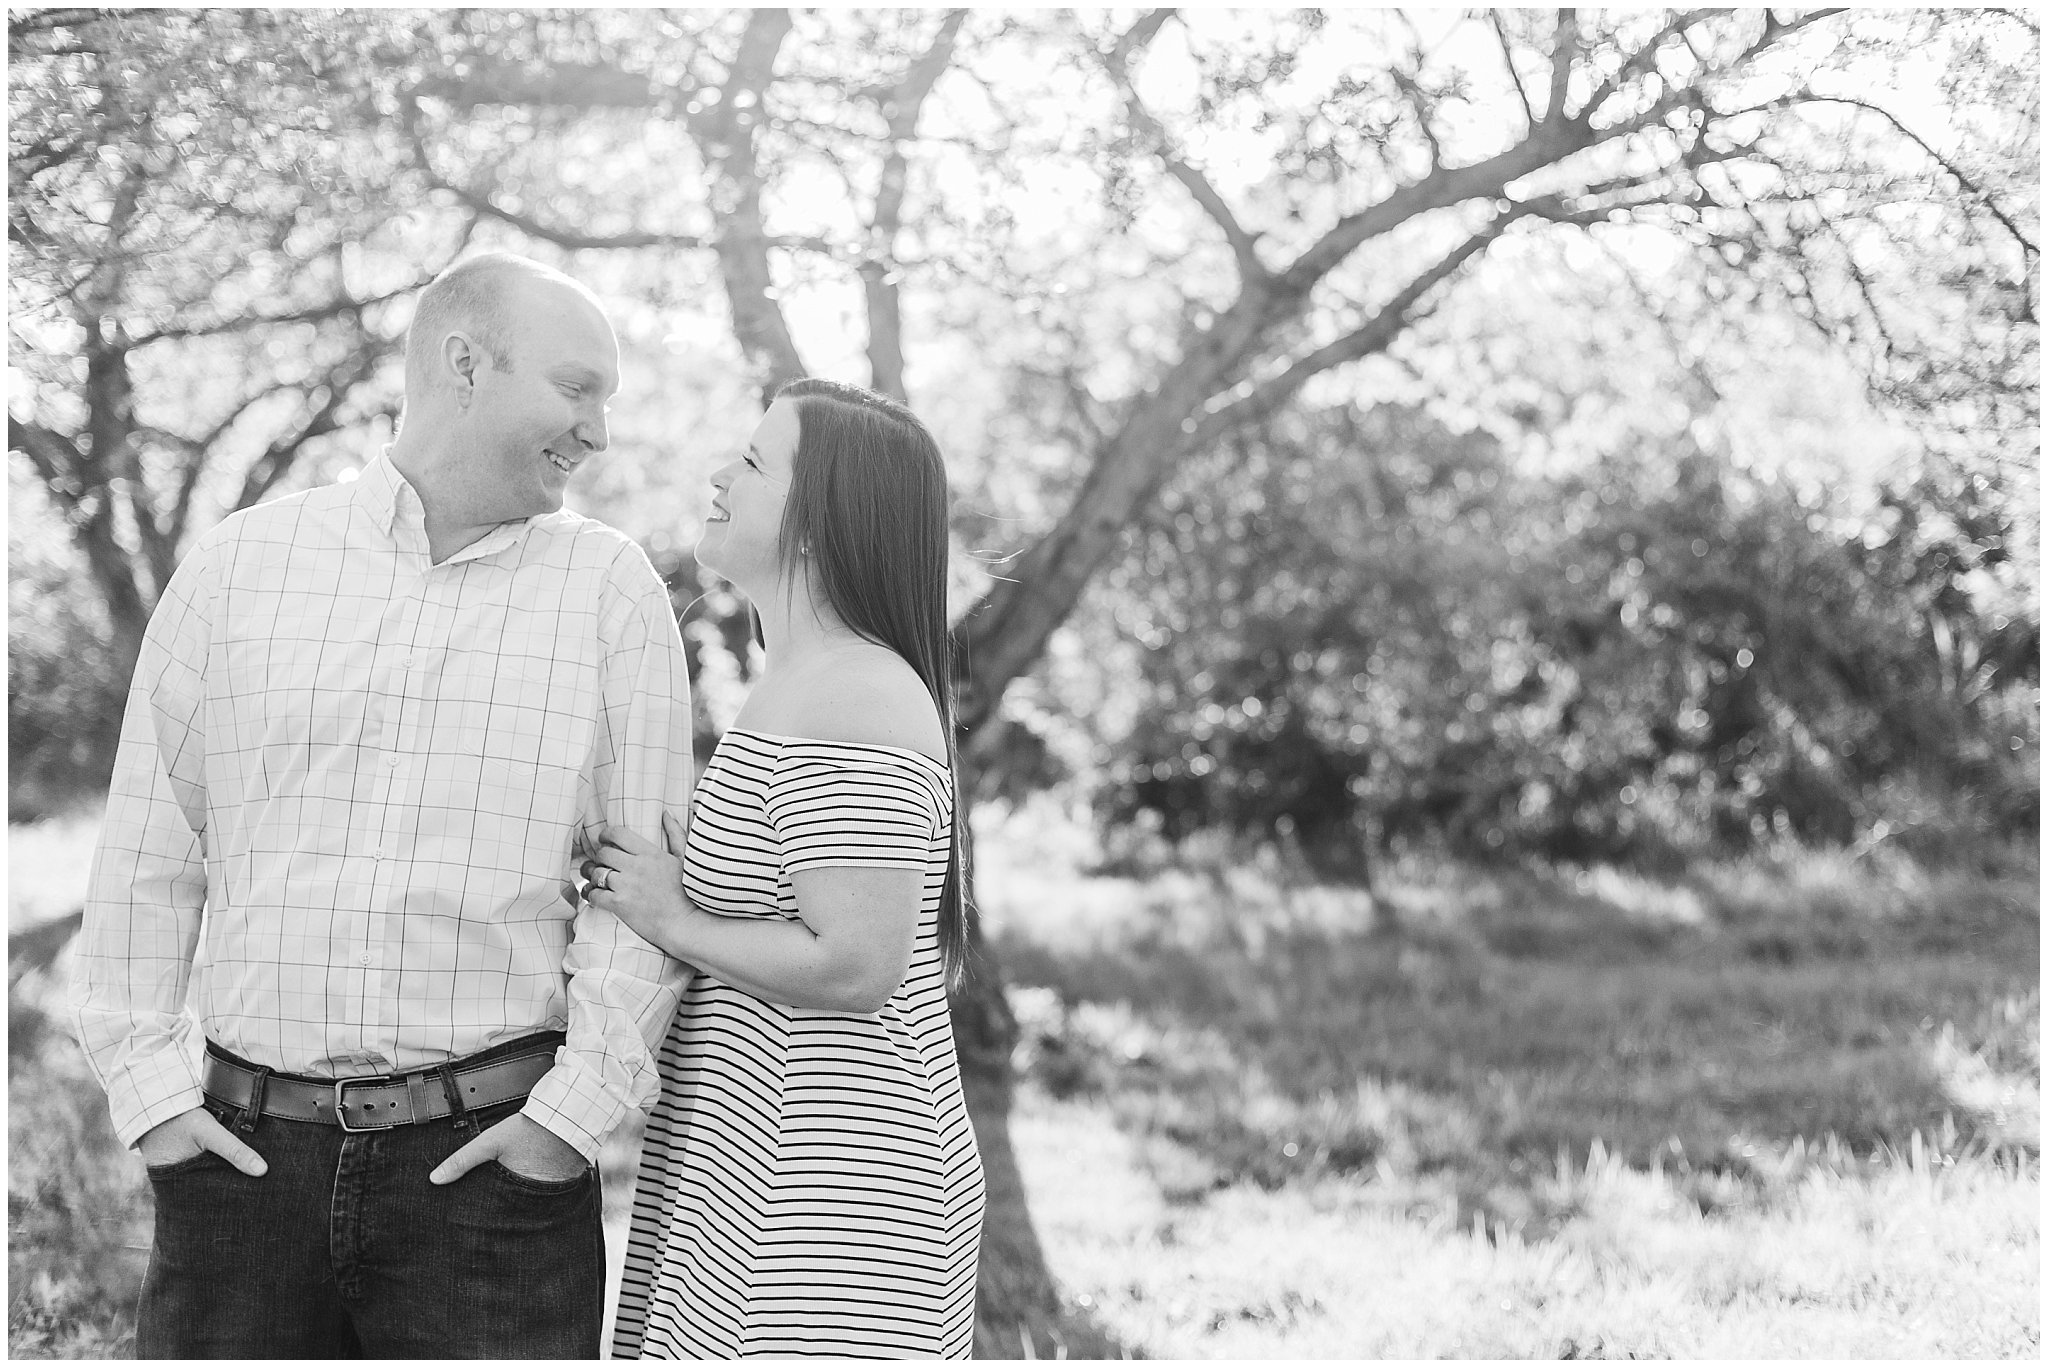 Frances Slocum State Park Springtime NEPA Engagement Session pennsylvania wedding and lifestyle photographer_0001.jpg